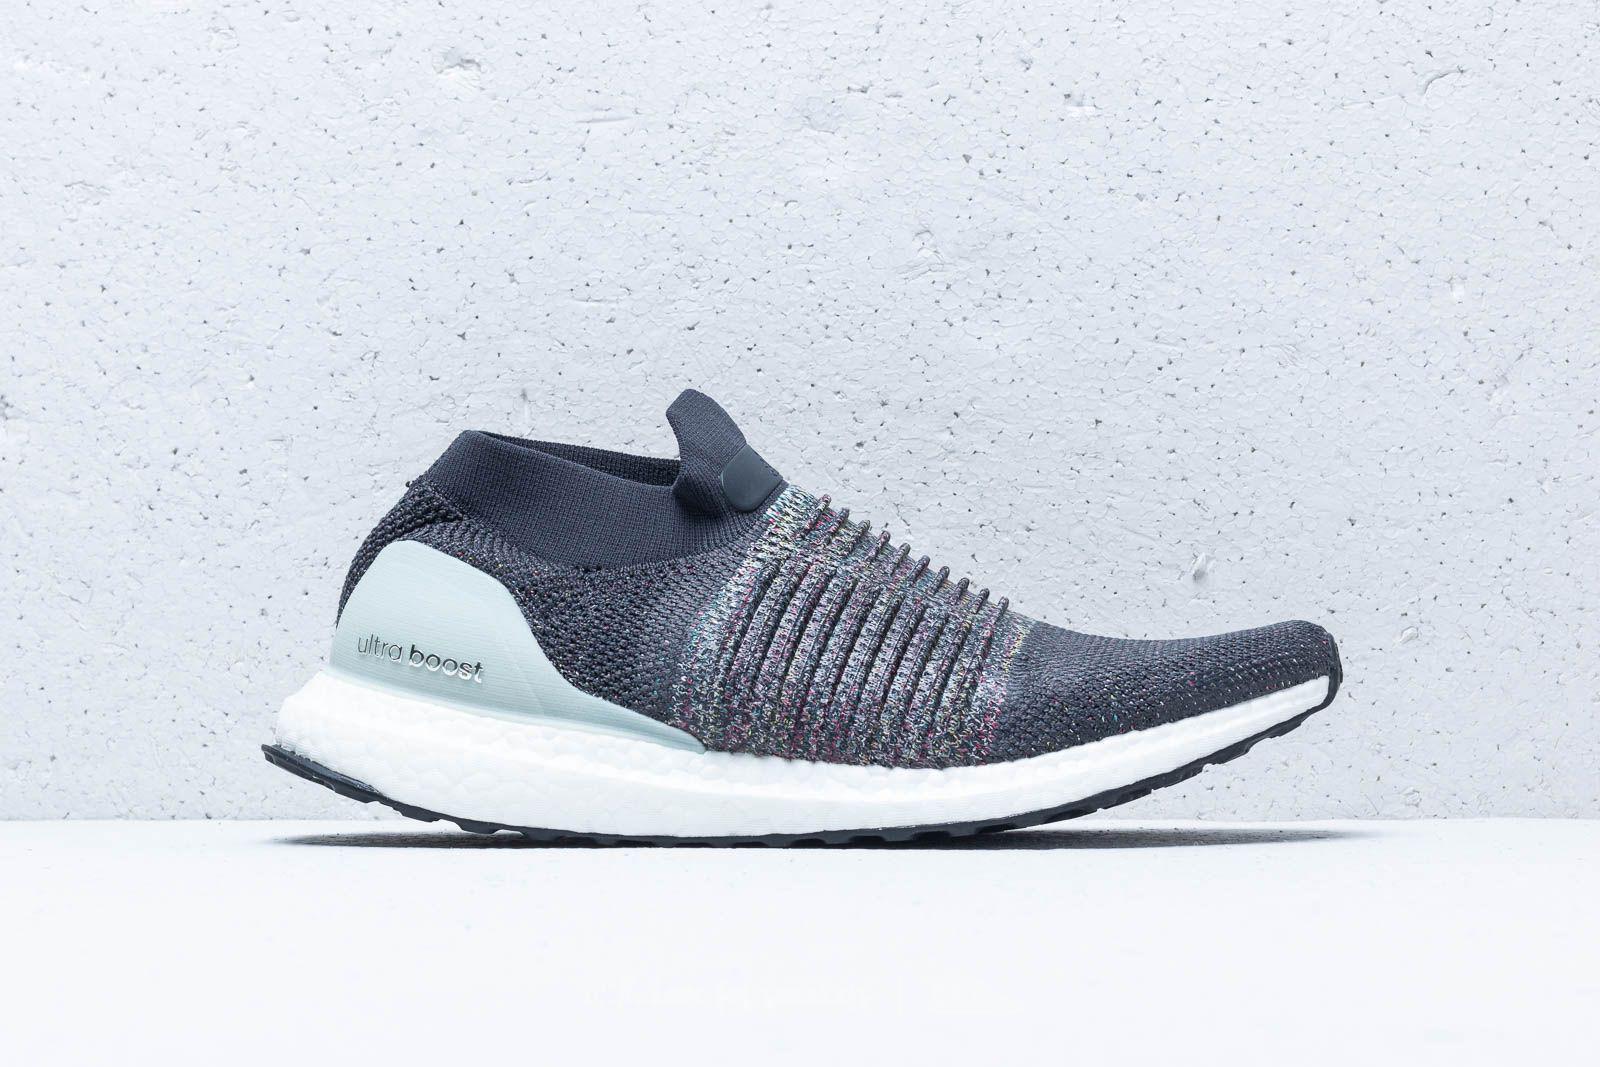 separation shoes 090fb d76fb footshop--Adidas-Ultraboost-Laceless-Carbon-Dgh-Solid-Grey-Ash-Silver.jpeg